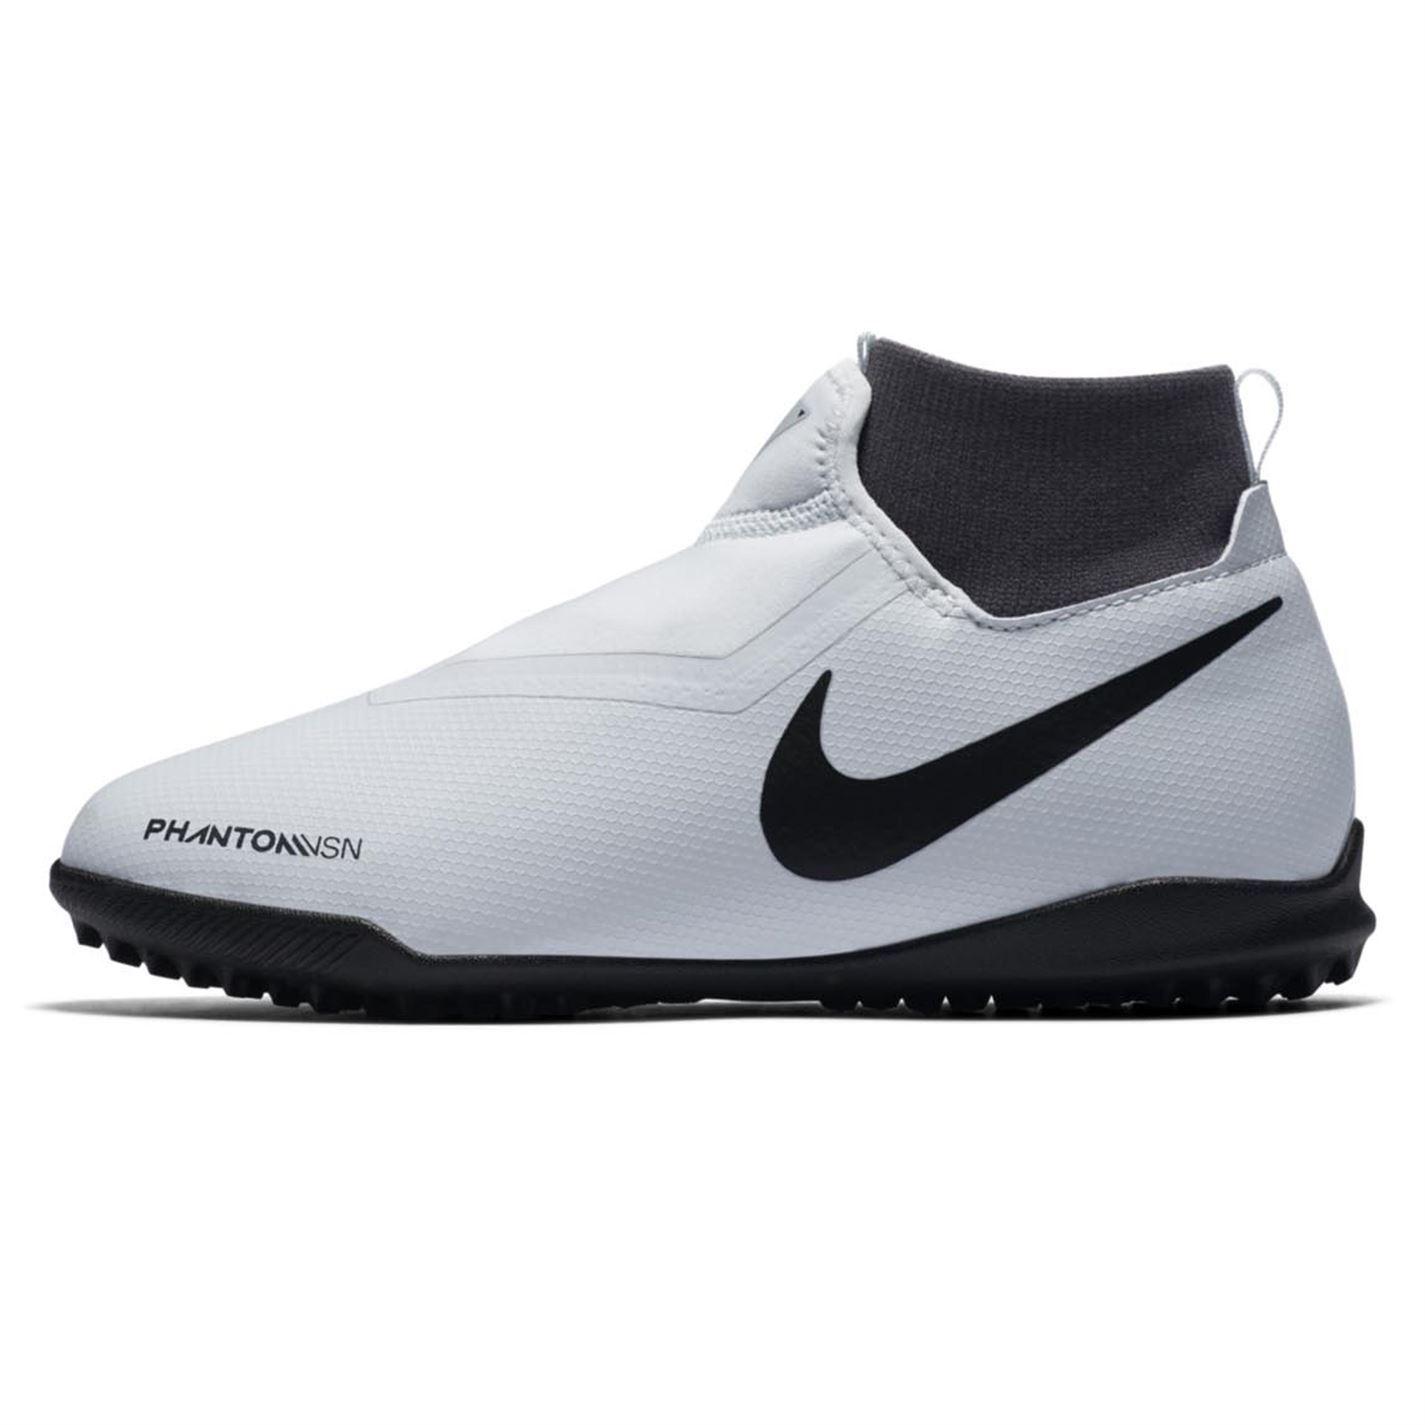 e66bc9ae6 ... Nike Phantom Vision Academy DF Astro Turf Football Trainers Juniors  Soccer Shoes